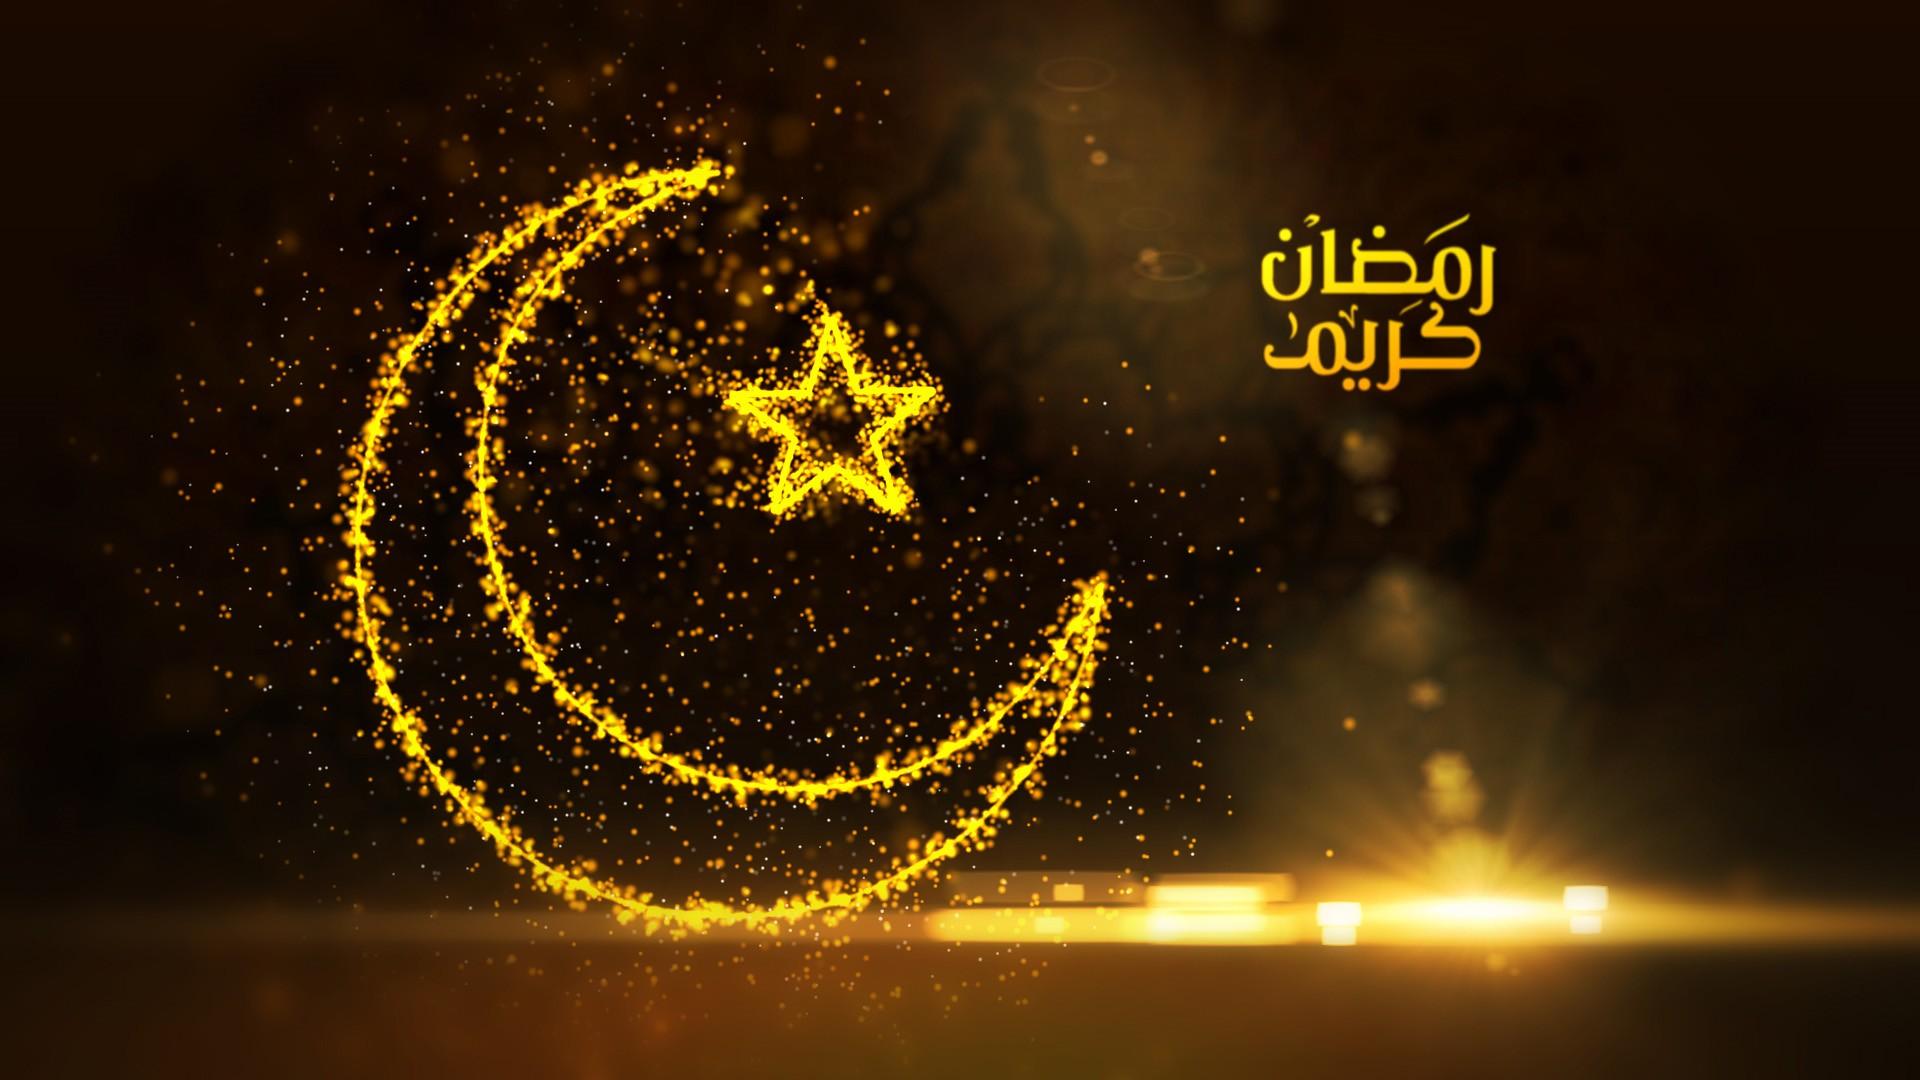 Ramadan Kareem Wishes 6